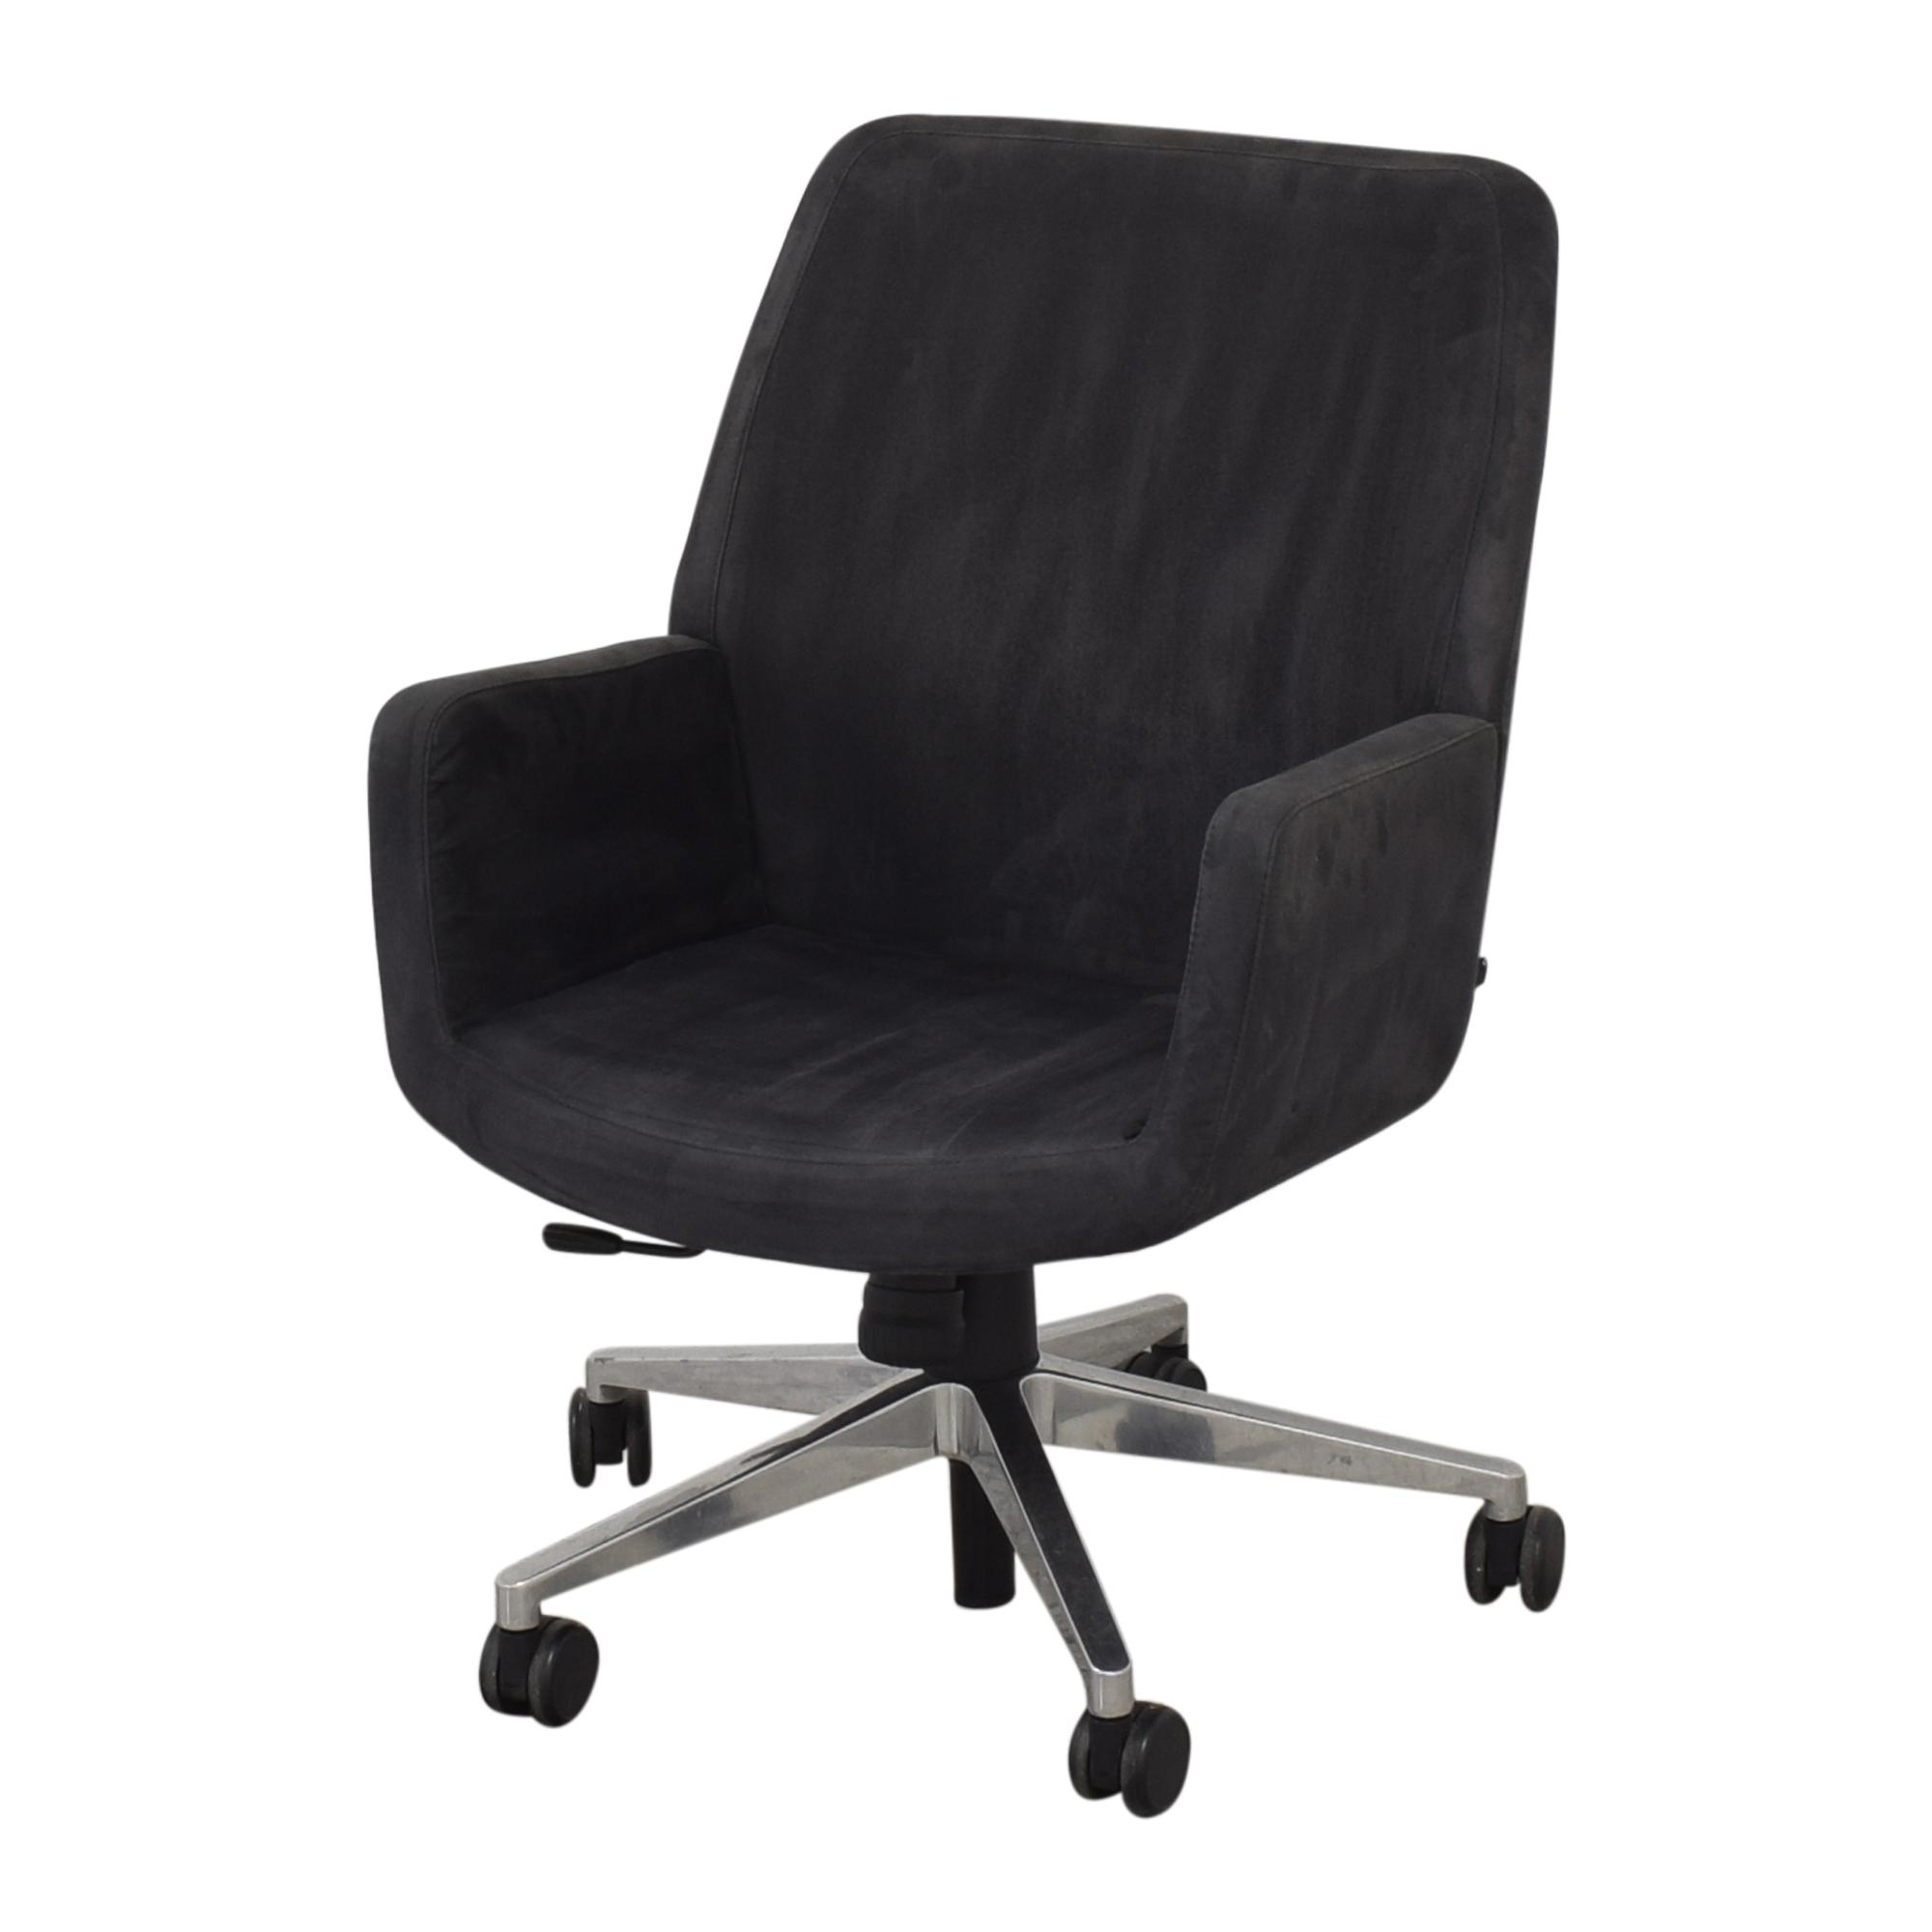 Steelcase Steelcase Coalesse Bindu Guest Chair Home Office Chairs